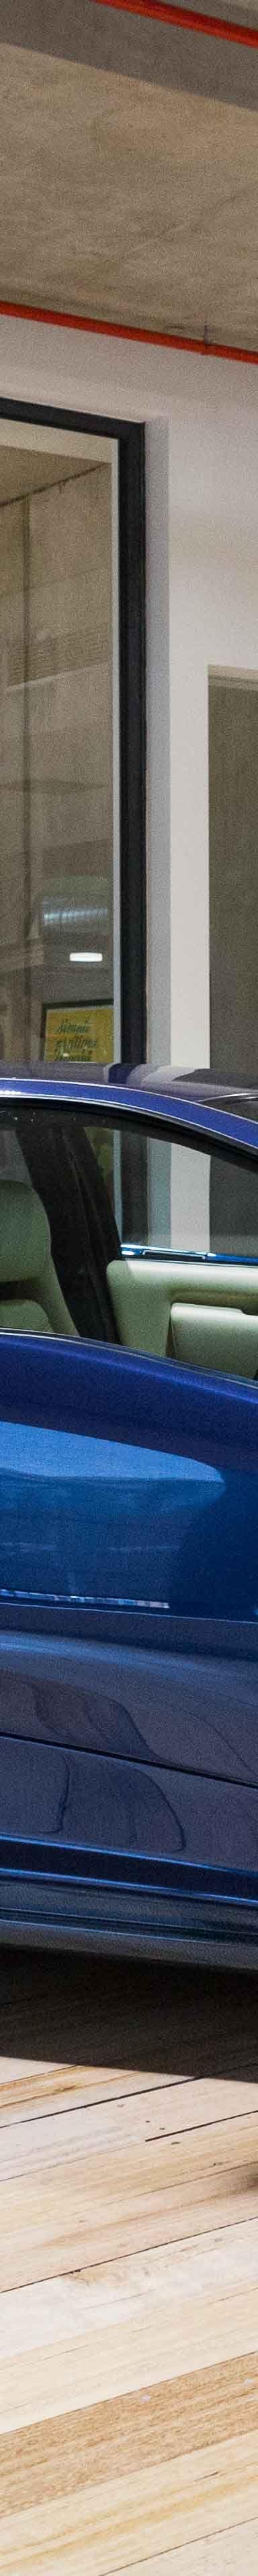 2000 Lamborghini Diablo VT - 6.0- sold in Australia